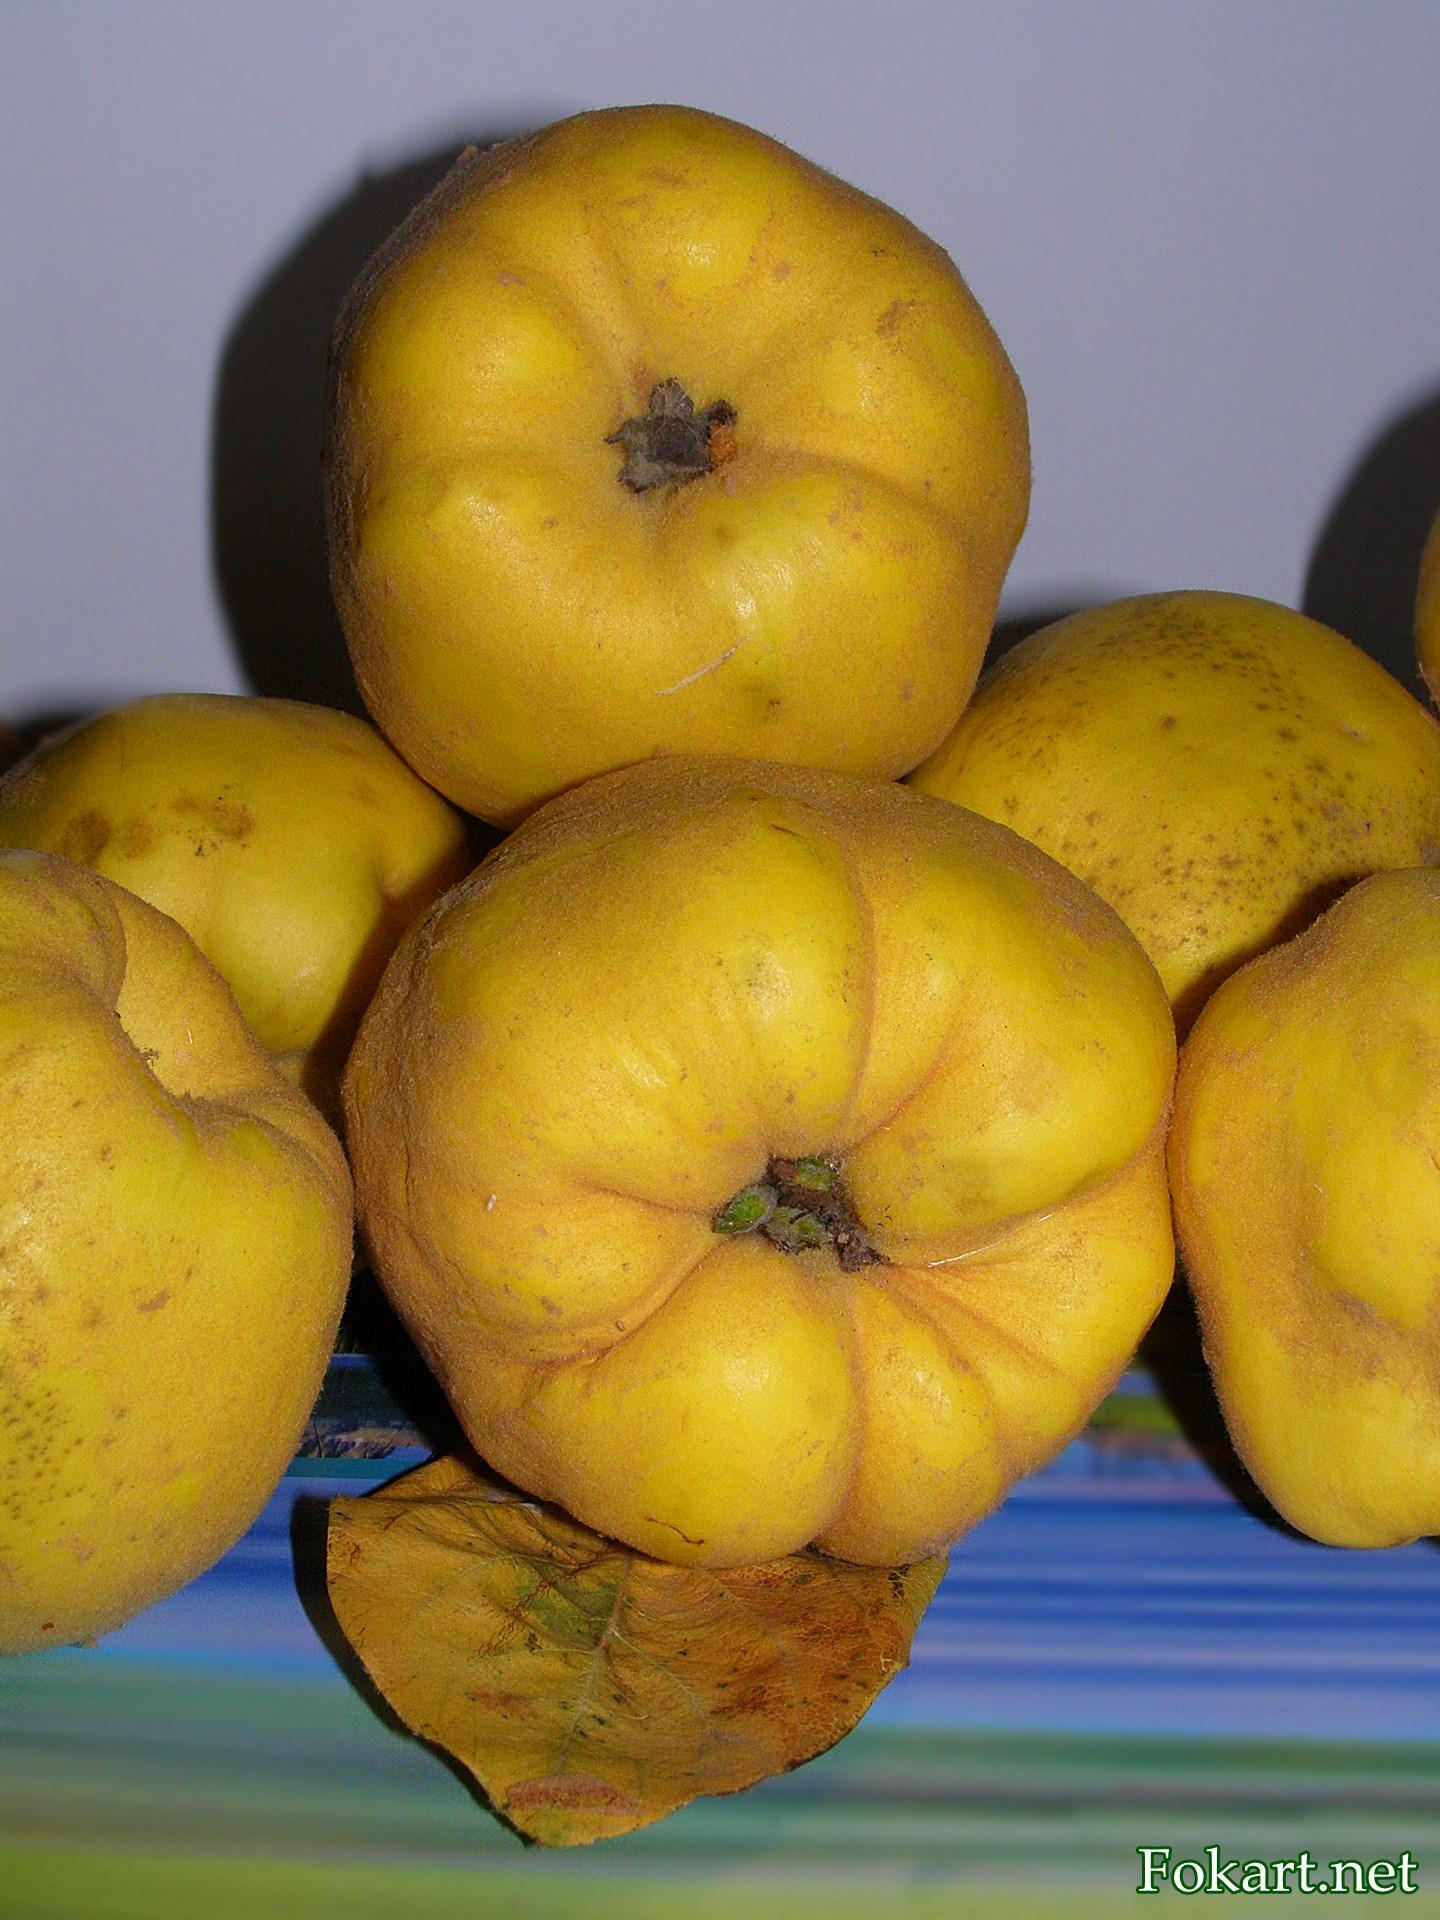 Тёмно-жёлтые шершавые плоды айвы